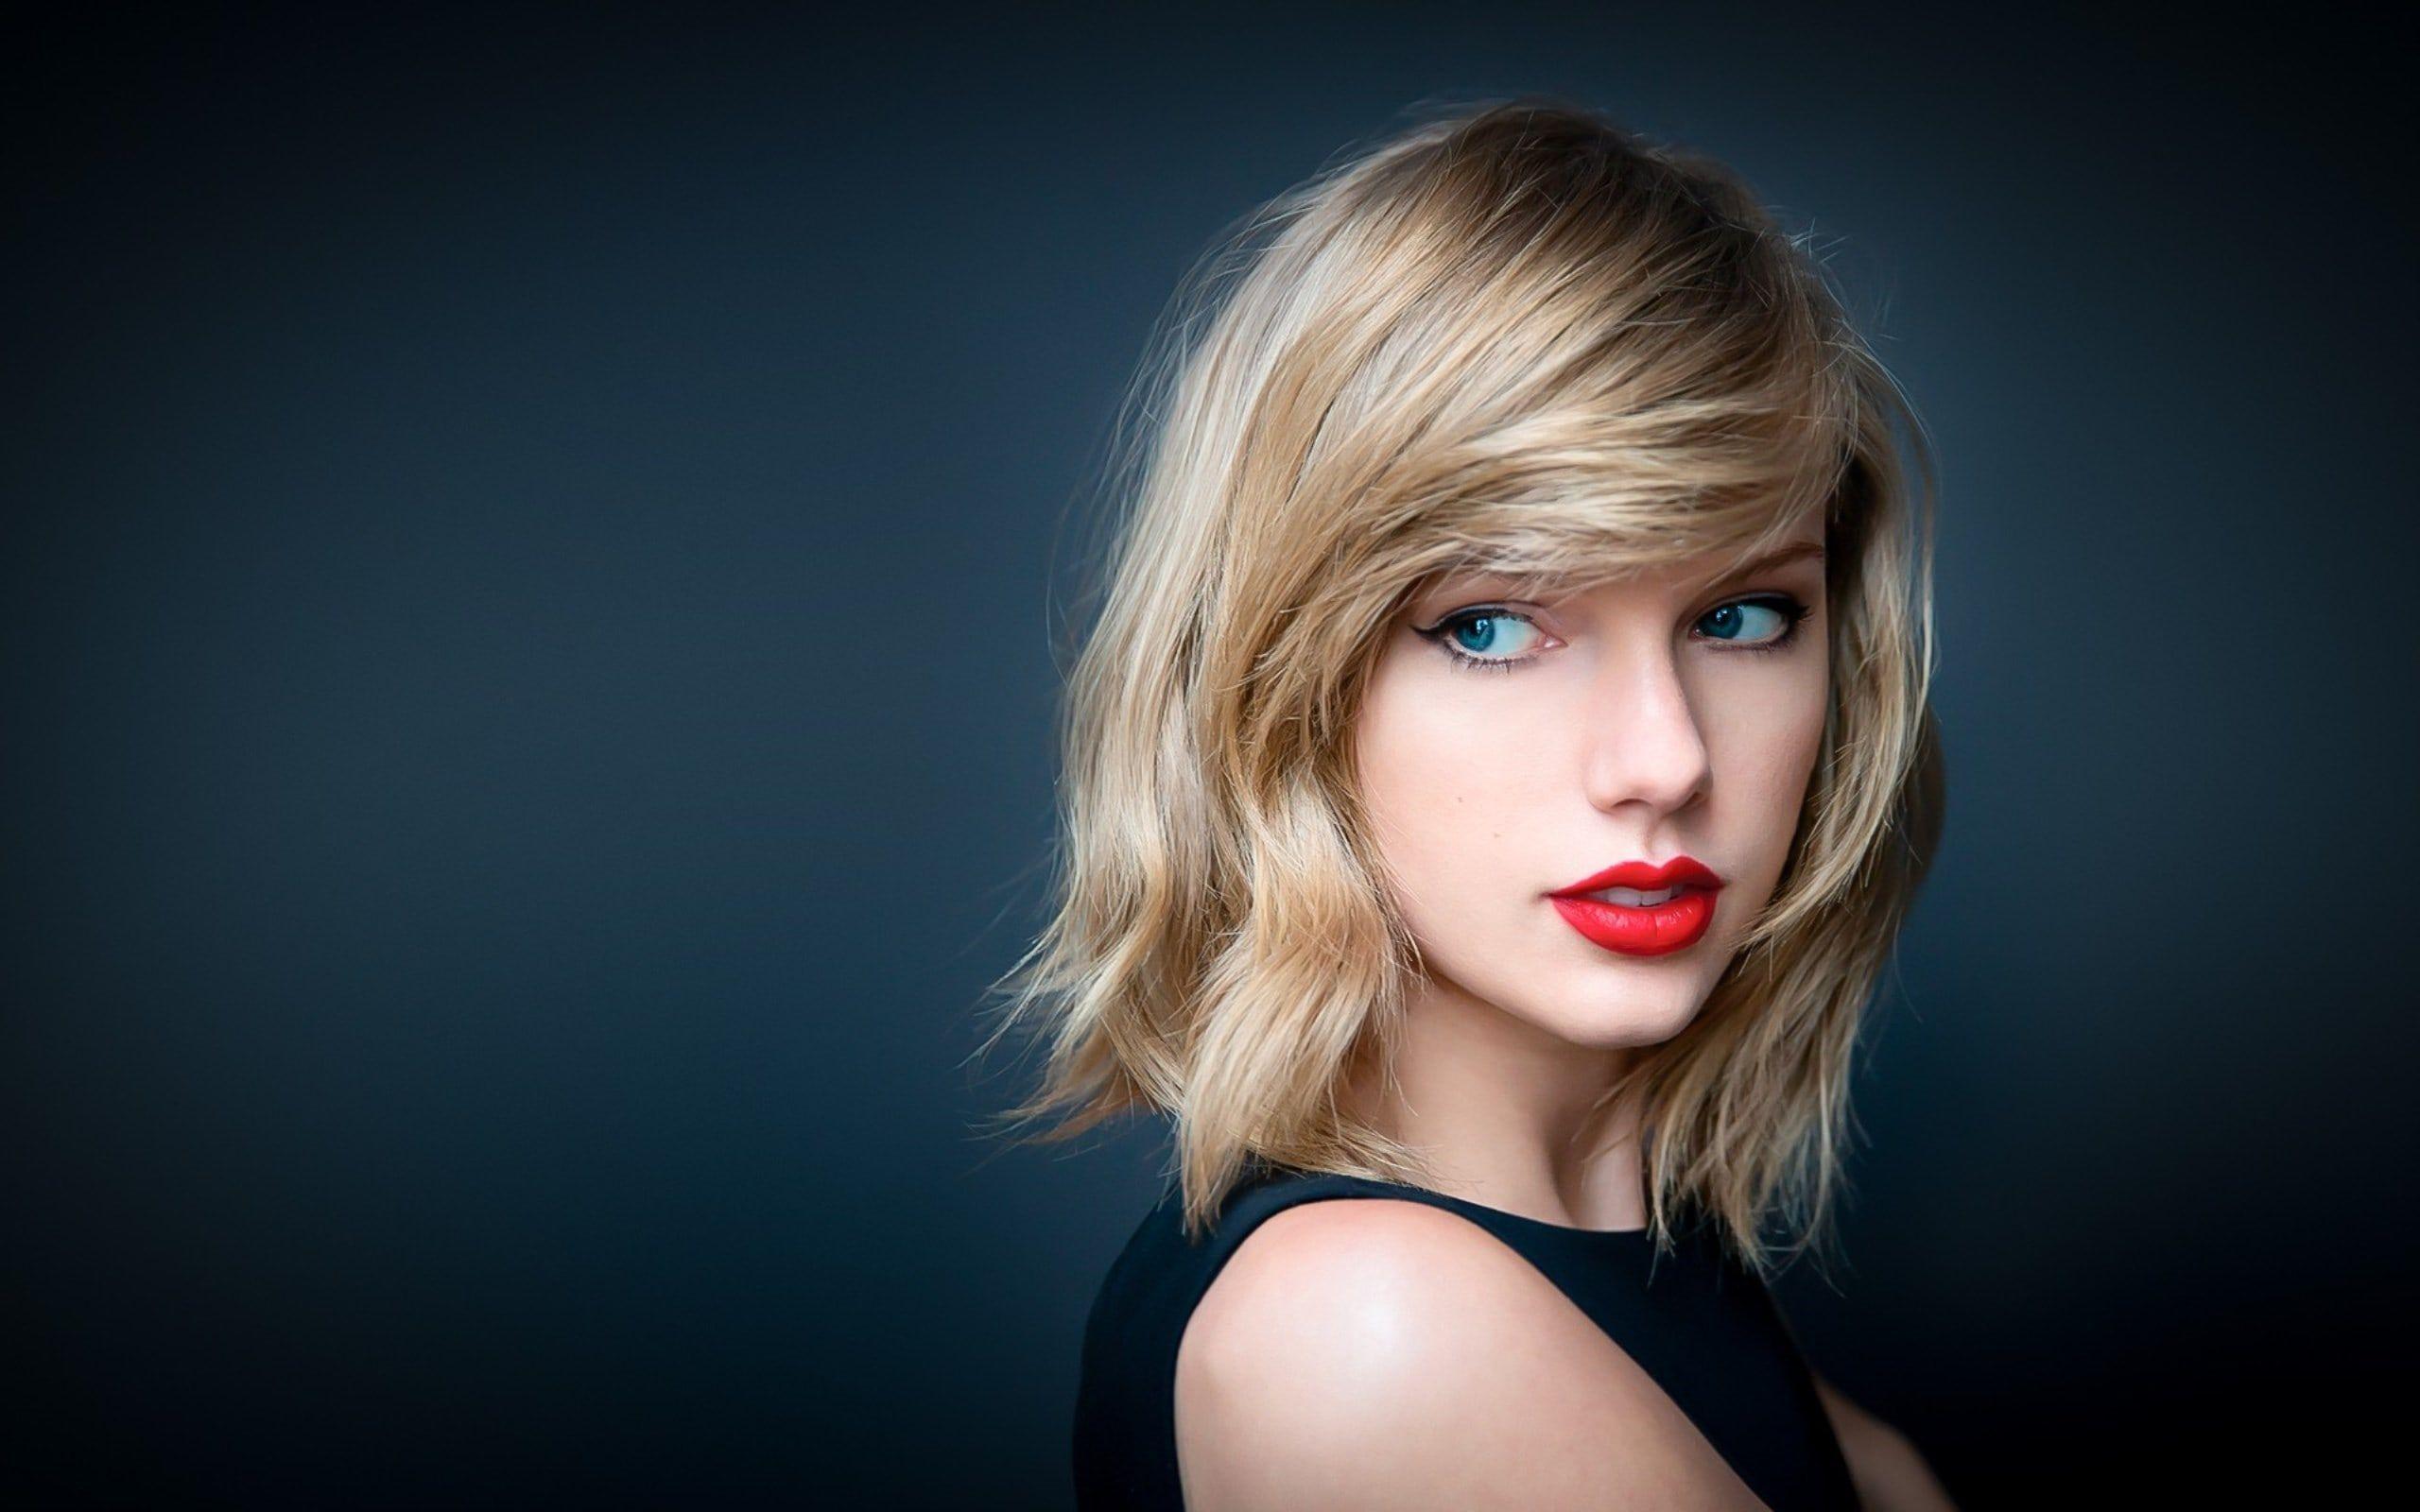 Taylor Swift Desktop Wallpapers Top Free Taylor Swift Desktop Backgrounds Wallpaperaccess